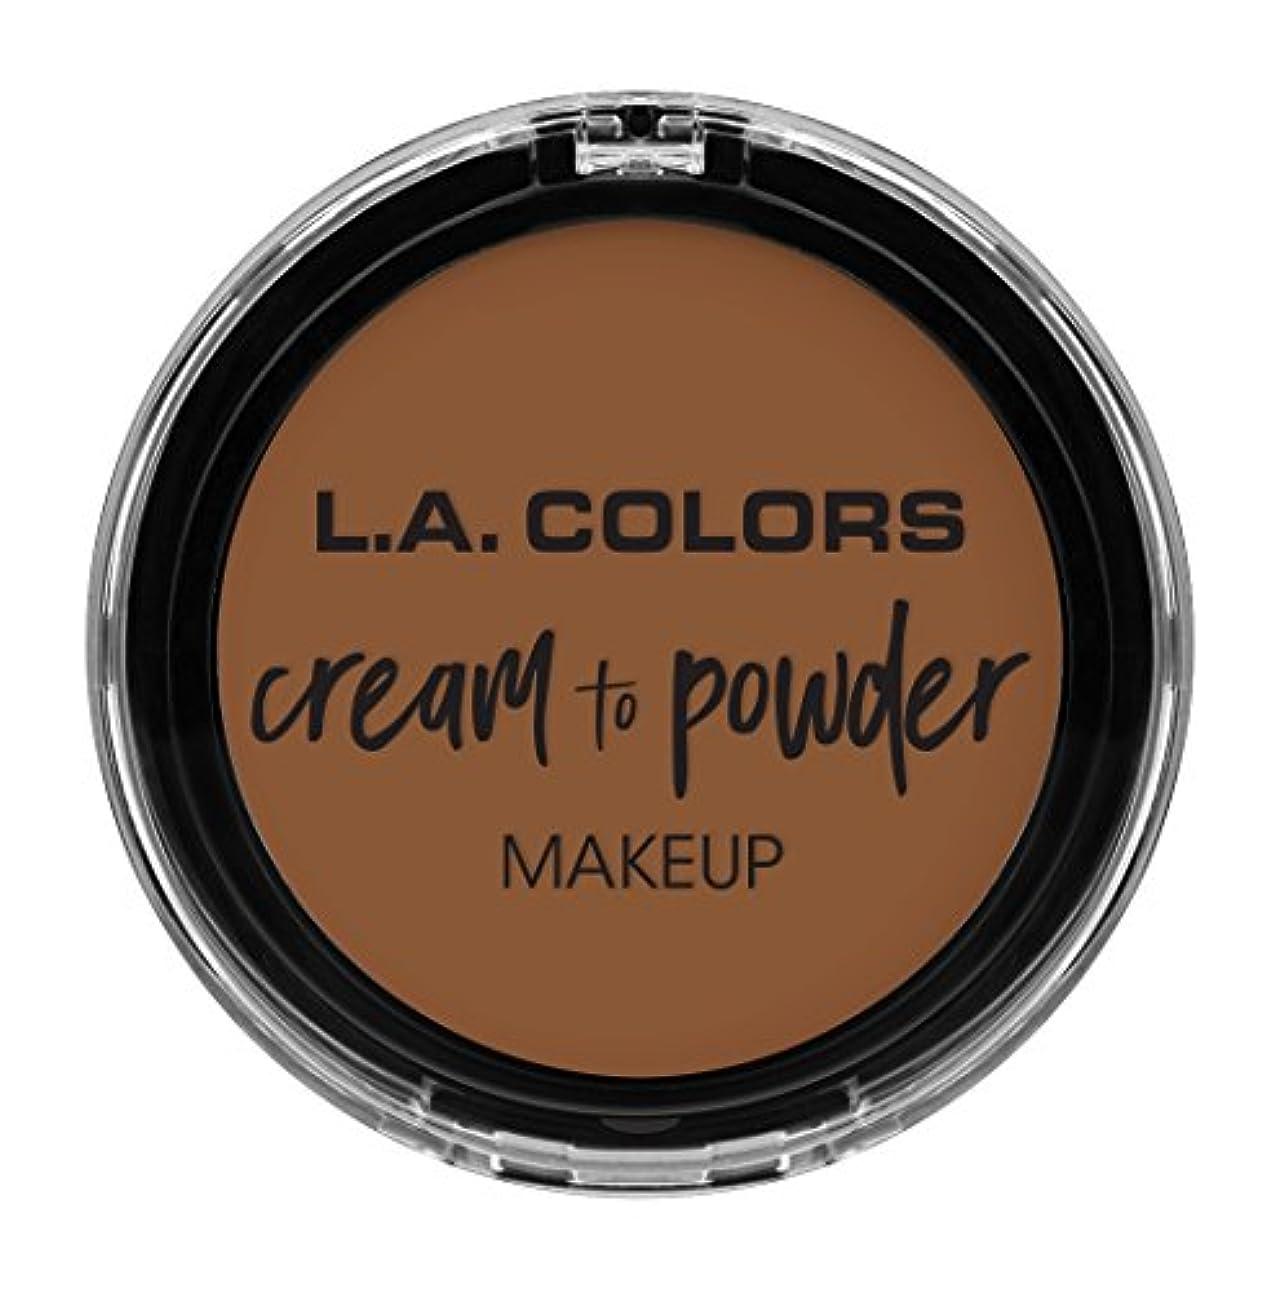 L.A. COLORS Cream To Powder Foundation - Tan (並行輸入品)